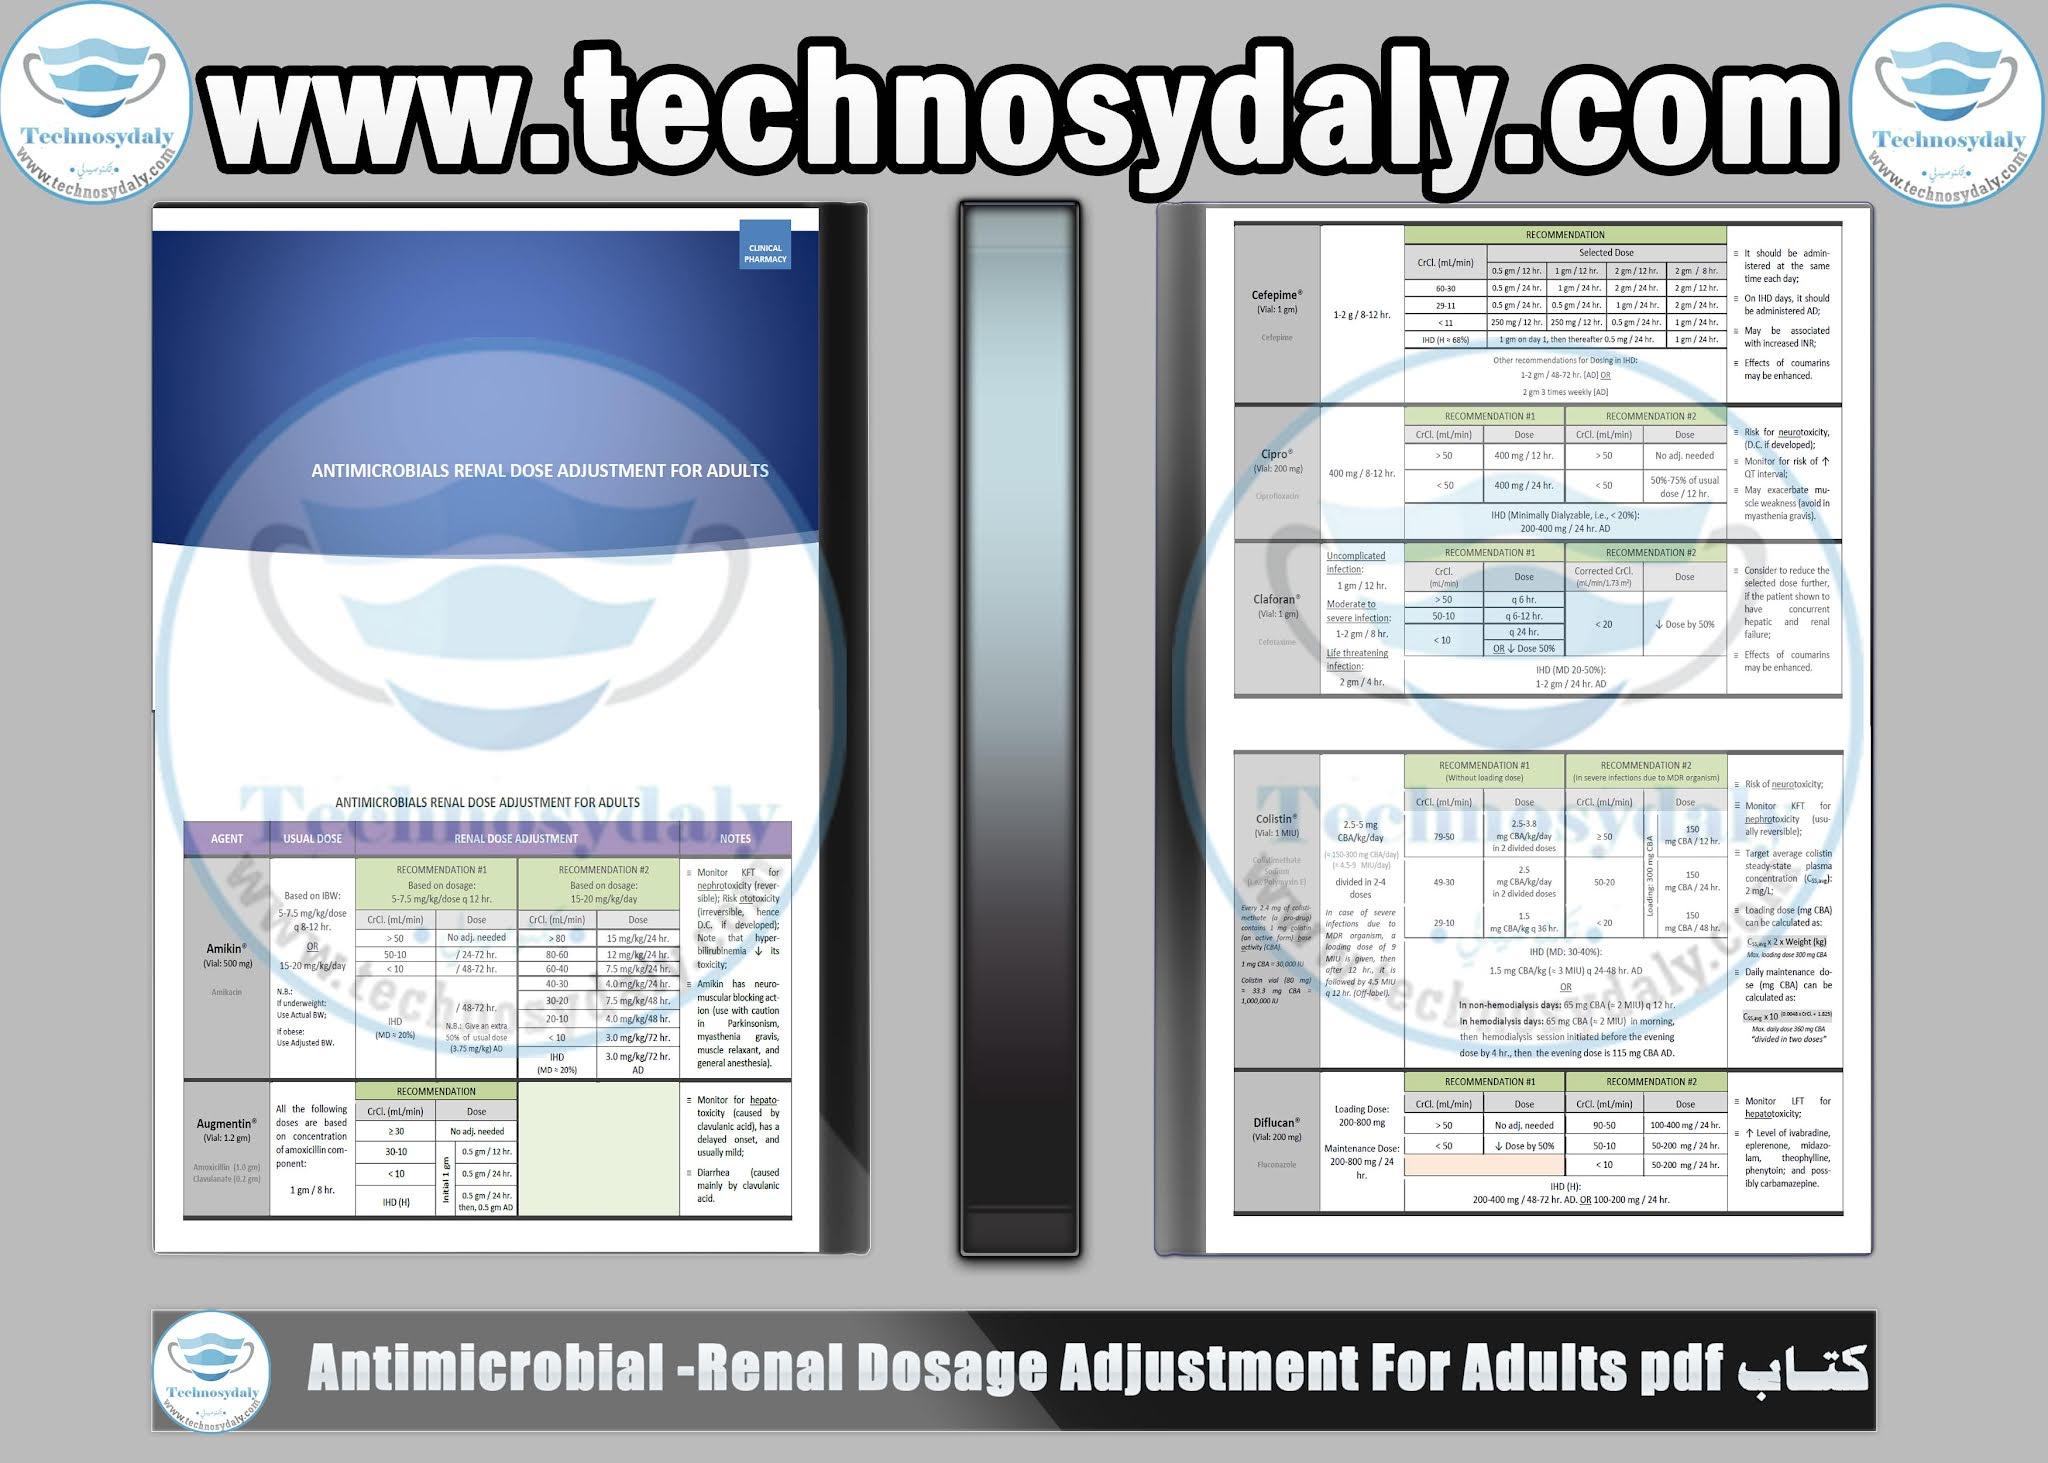 كتاب Antimicrobial -Renal Dosage Adjustment For Adults pdf